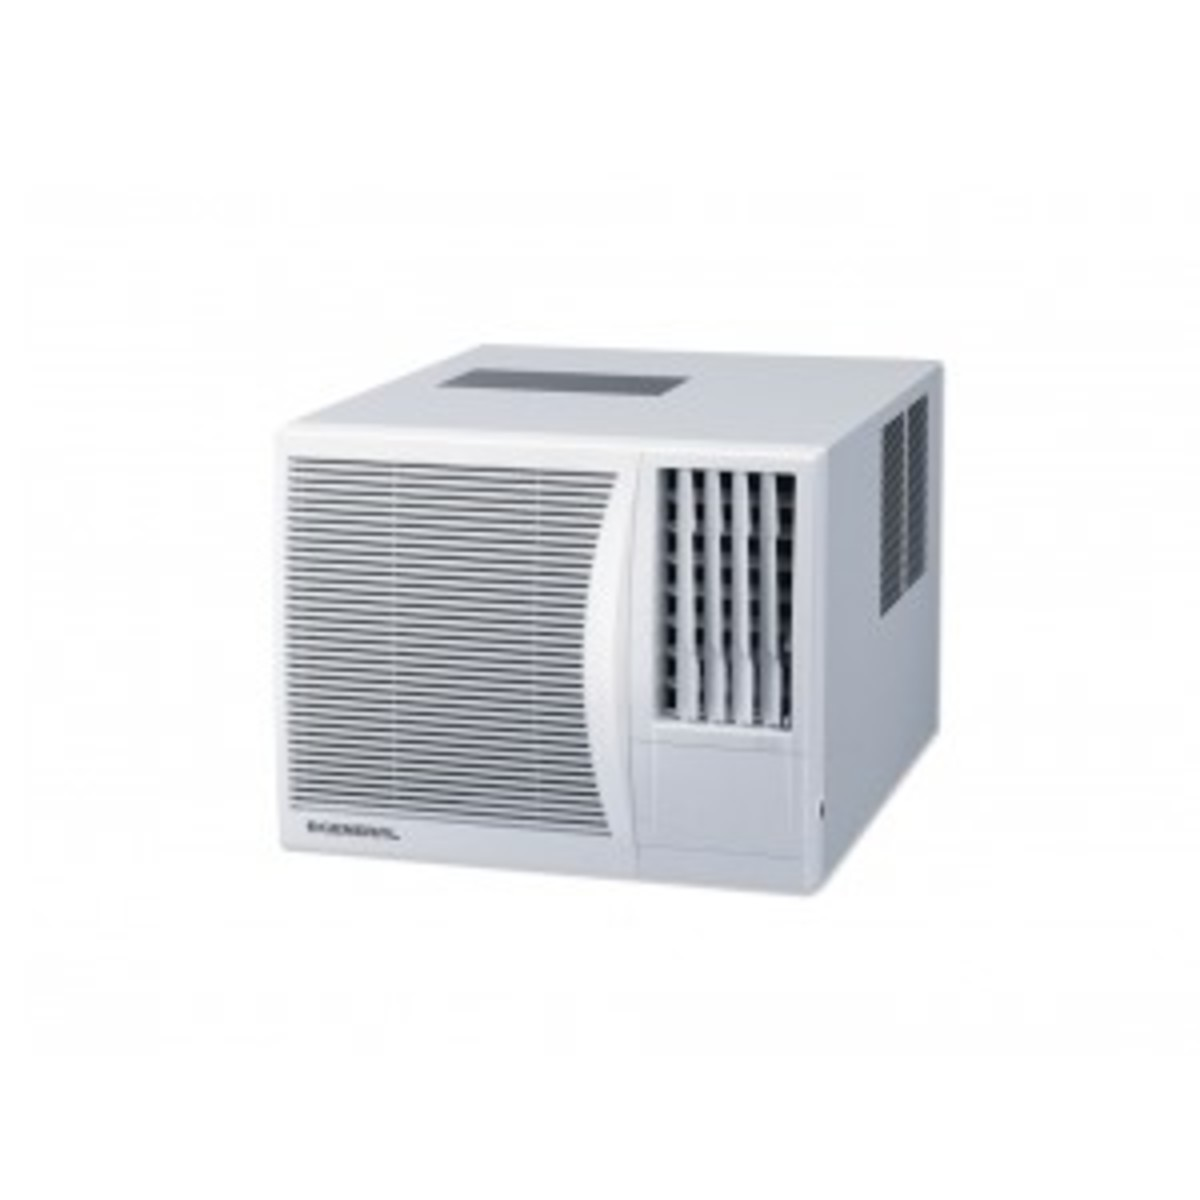 AKWA7FNR 3/4 HP Window Type Air Conditioner G1